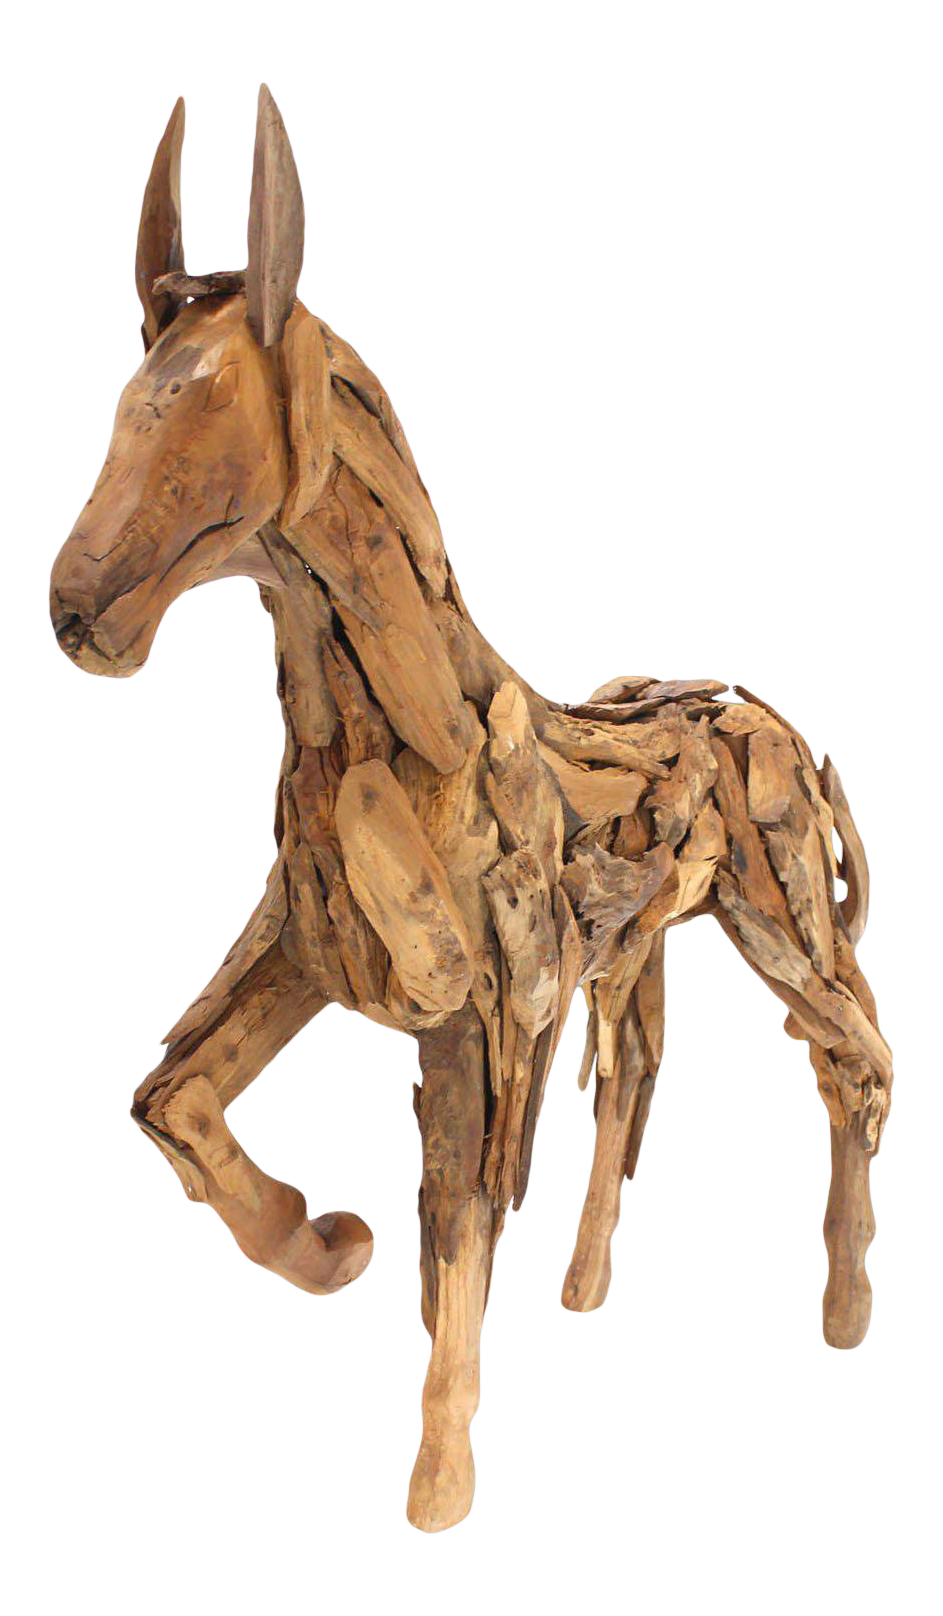 Early 20th Century Antique Reclaimed Wood Folk Art Horse Sculpture Chairish